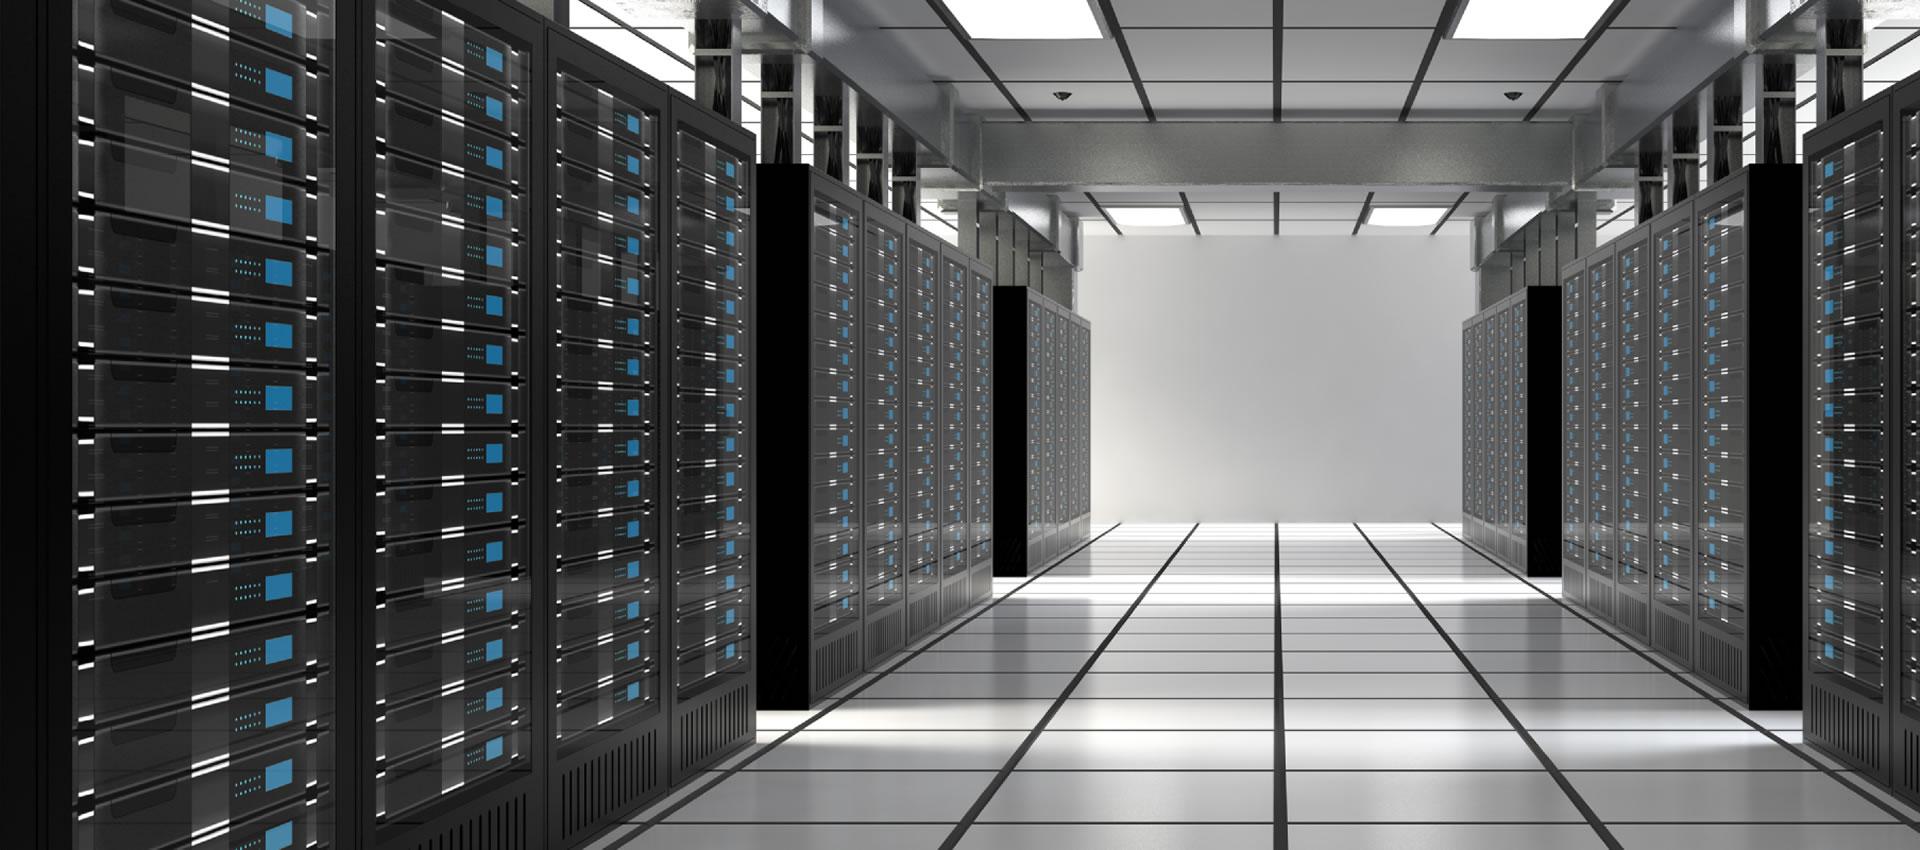 Интернет - сервер: аренда и преимущества